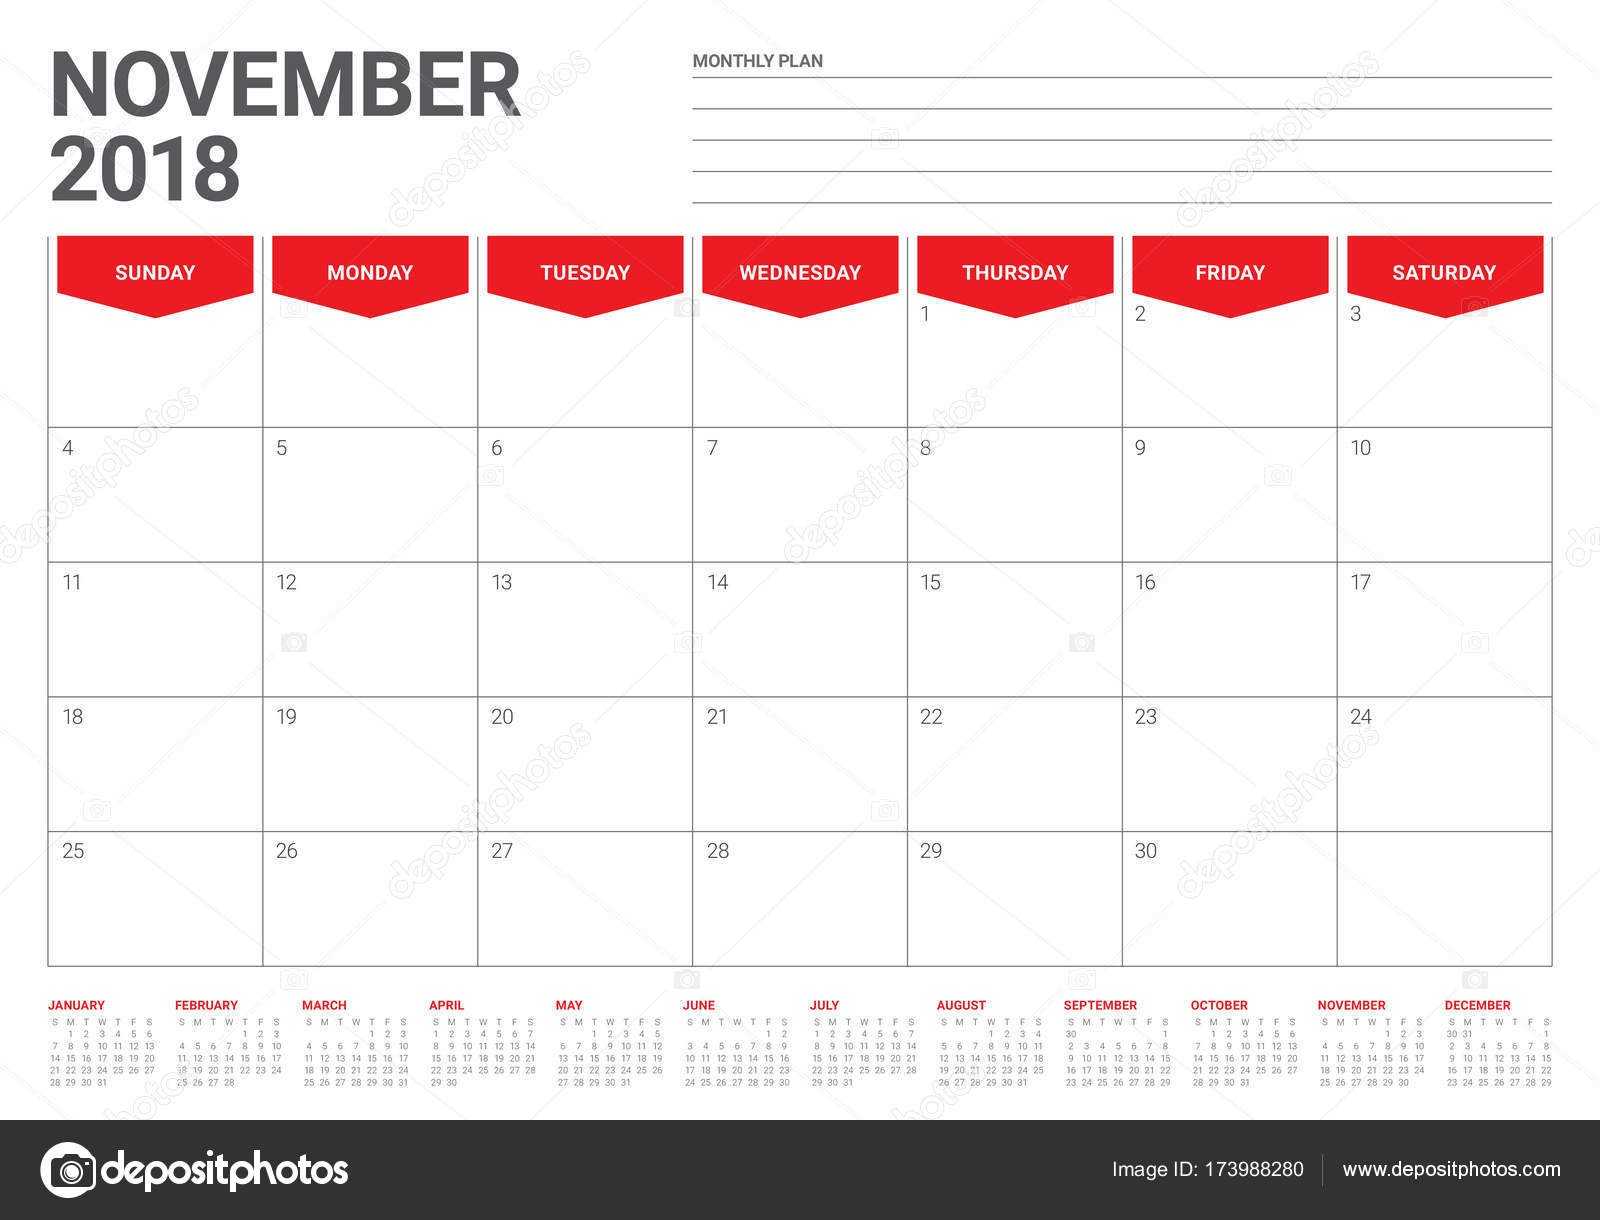 depositphotos stock illustration november 2018 planner calendar vector